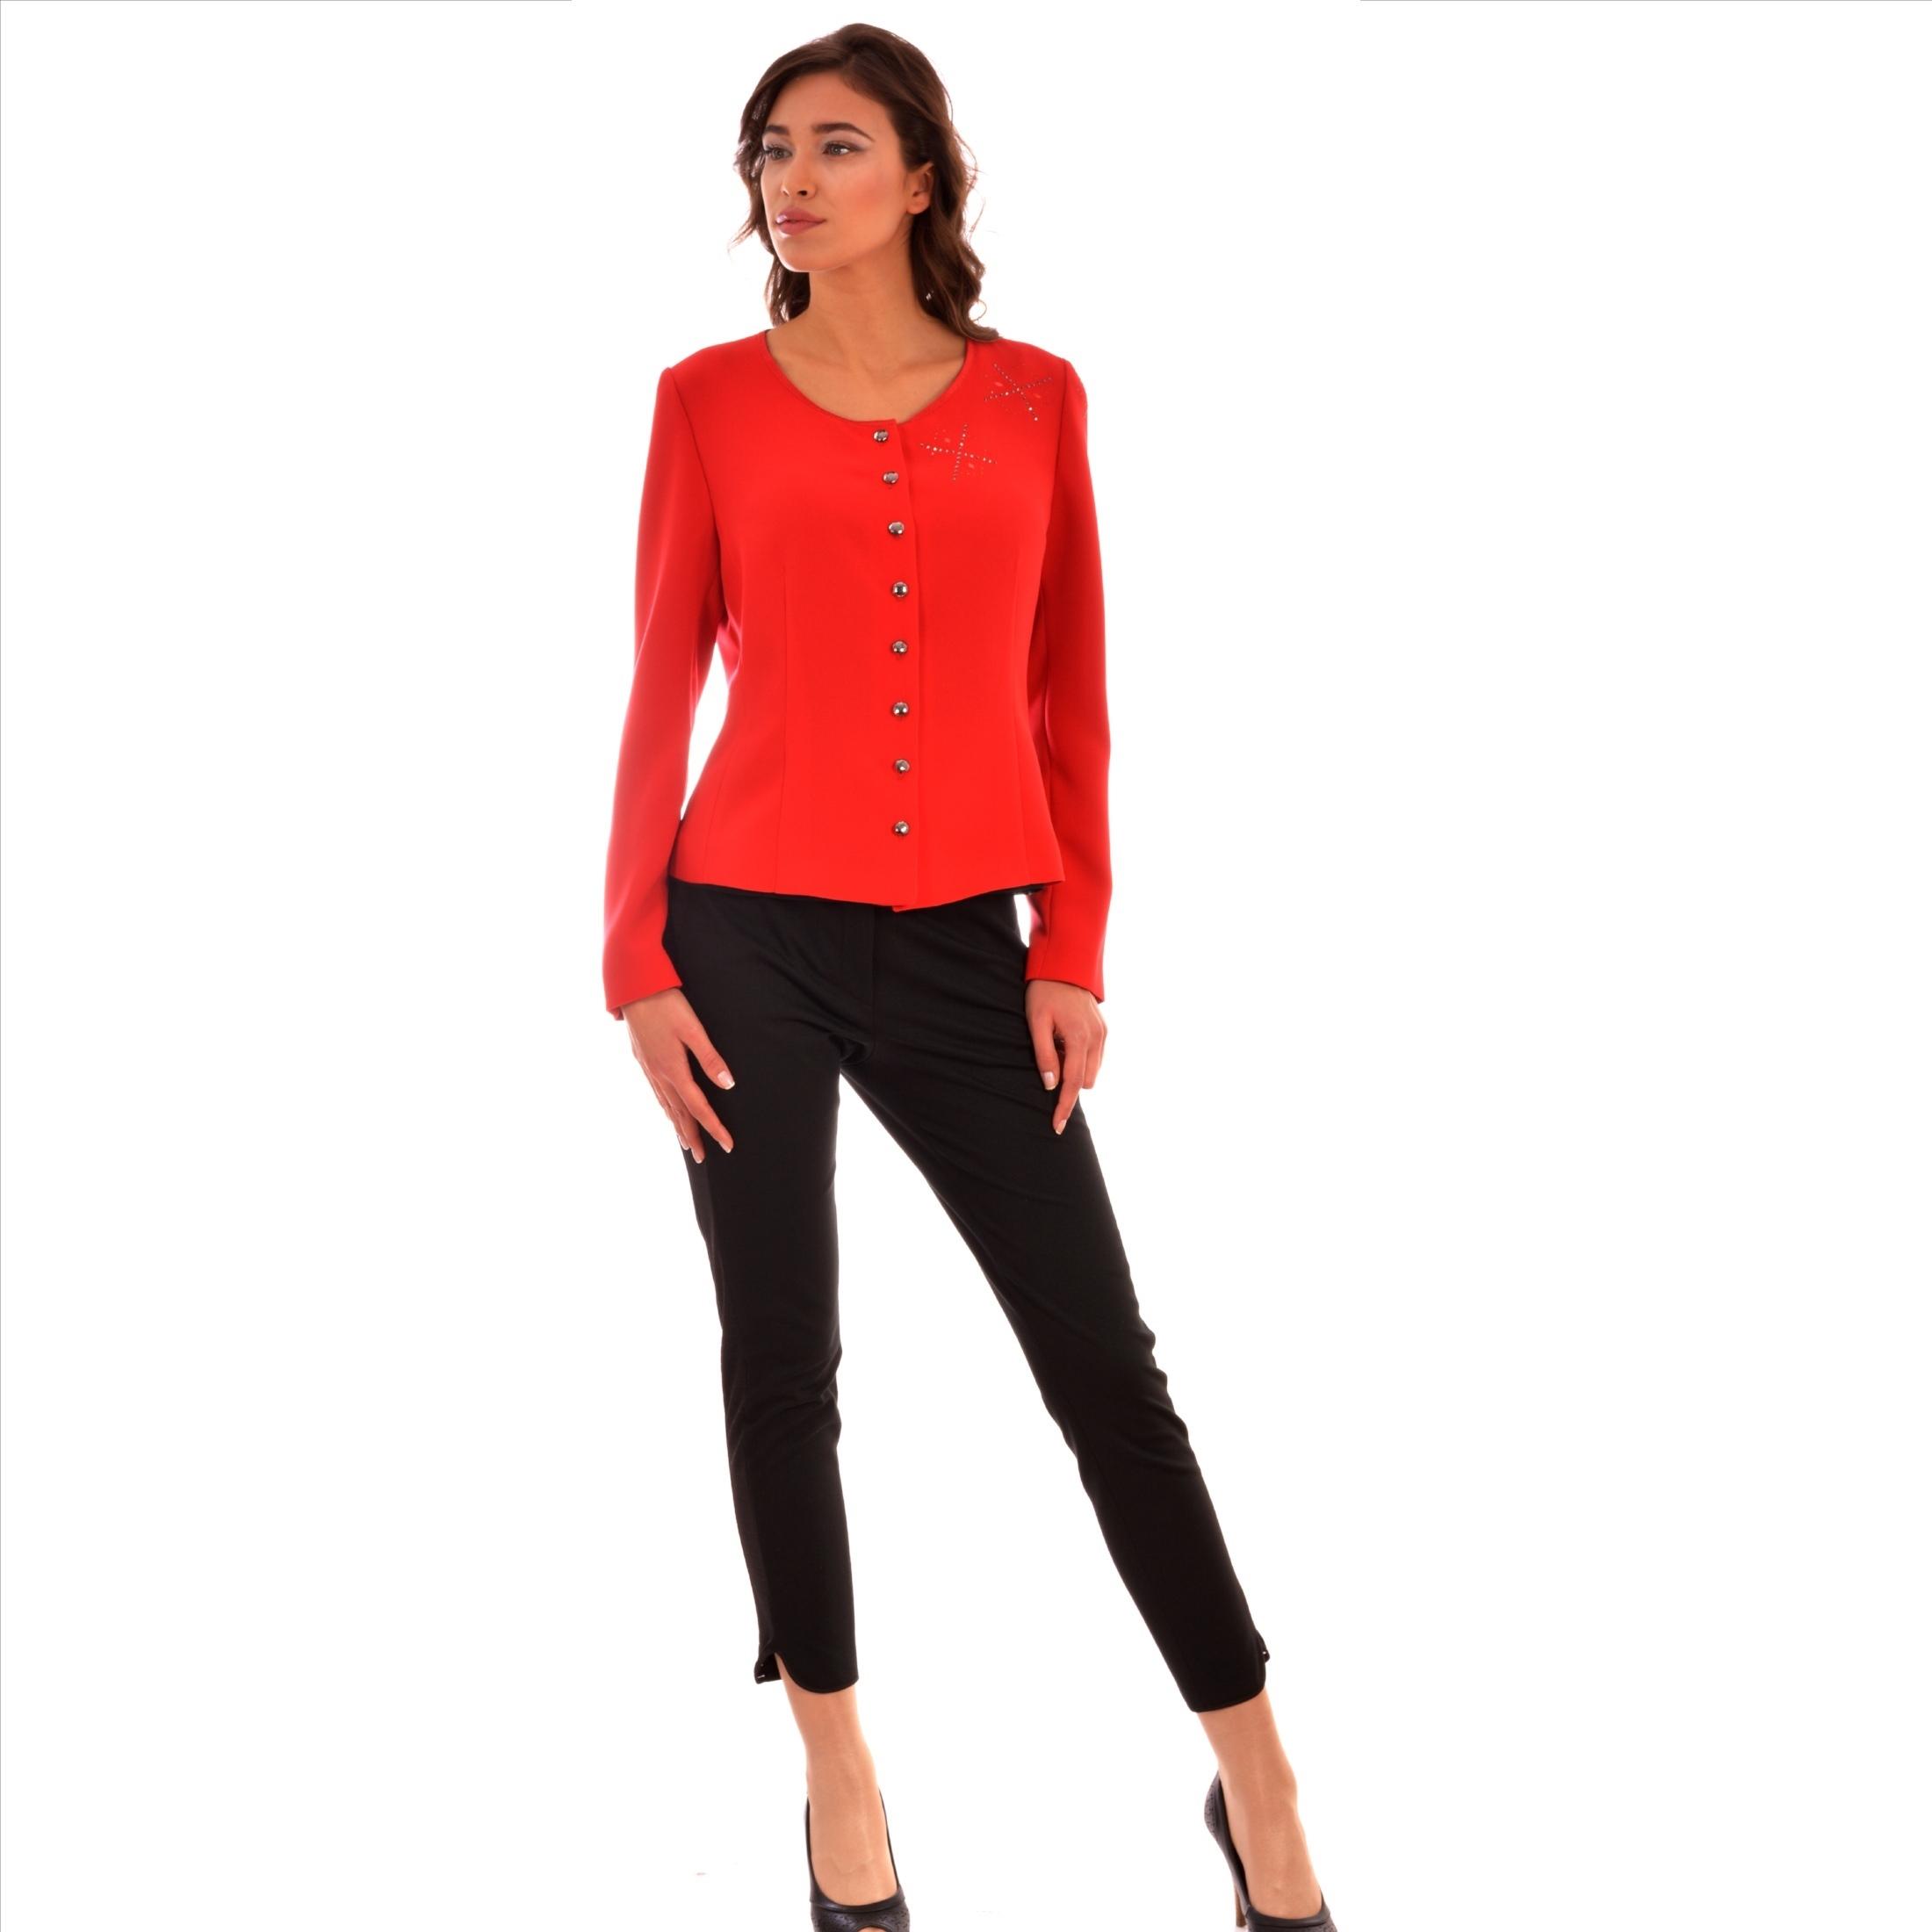 women's red blazer